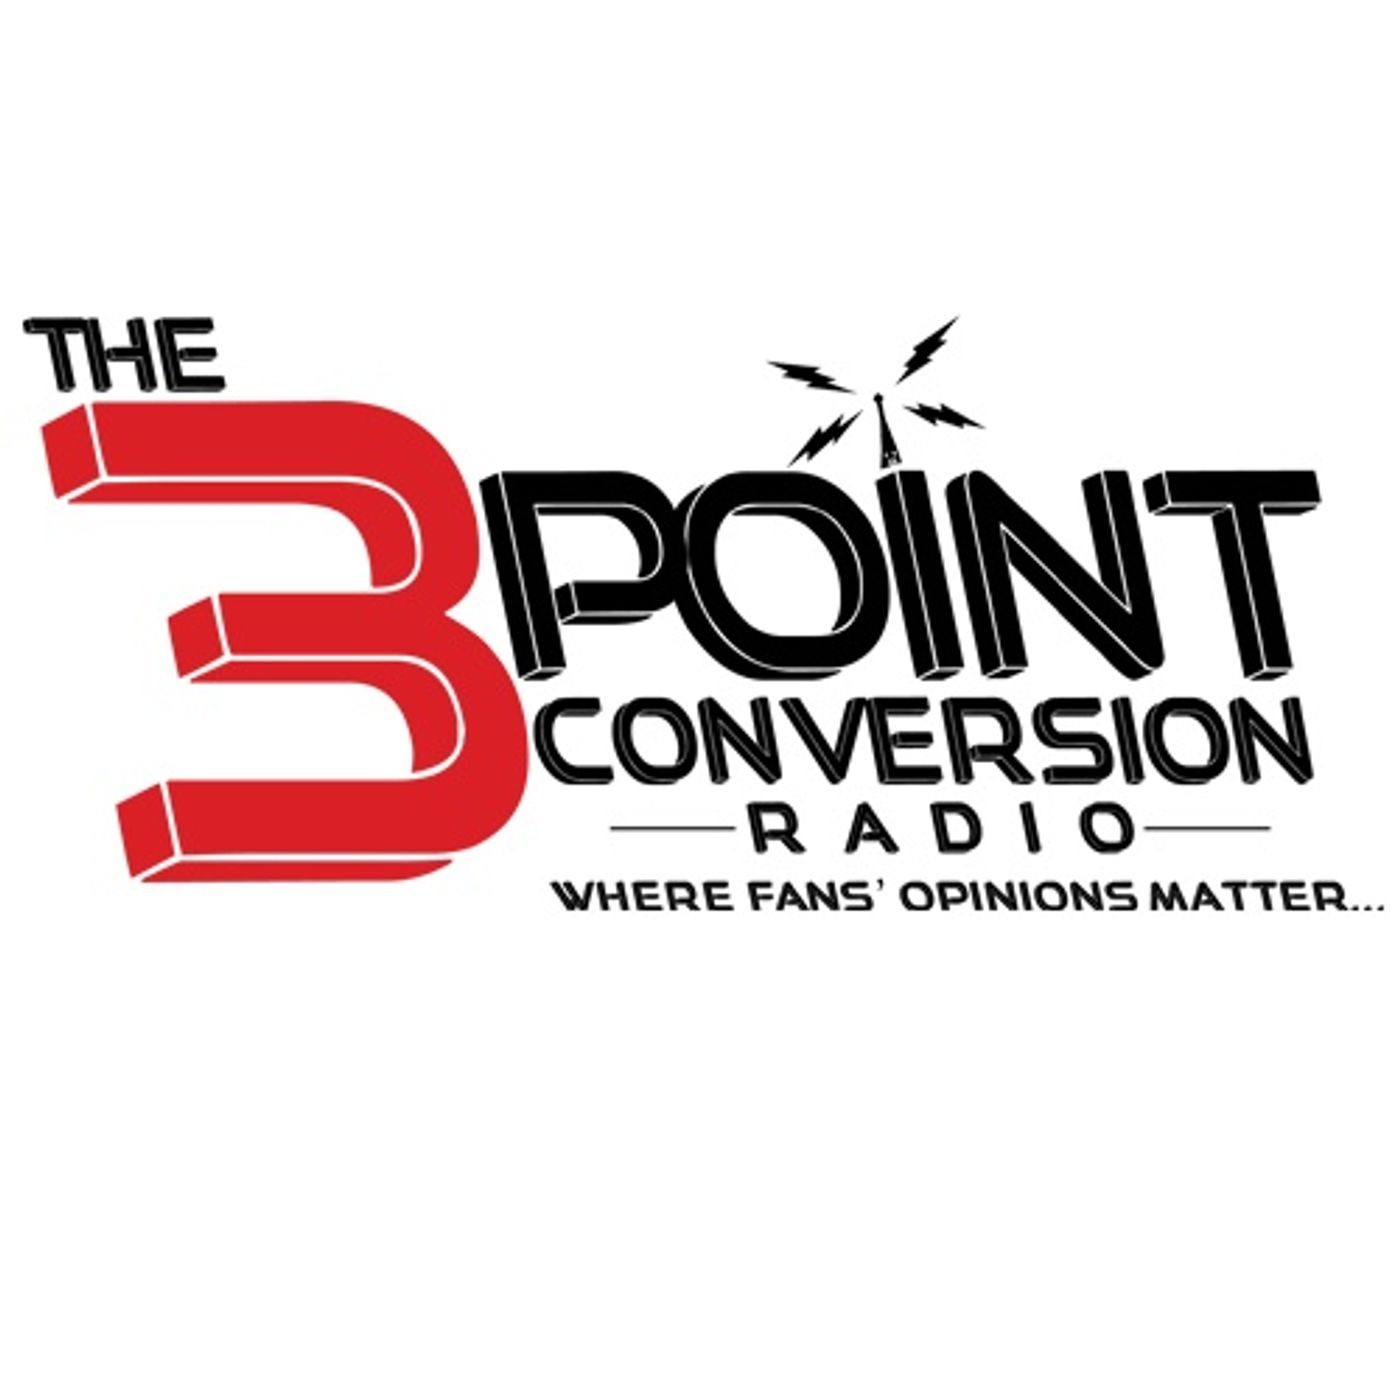 The 3 Point Conversion Radio